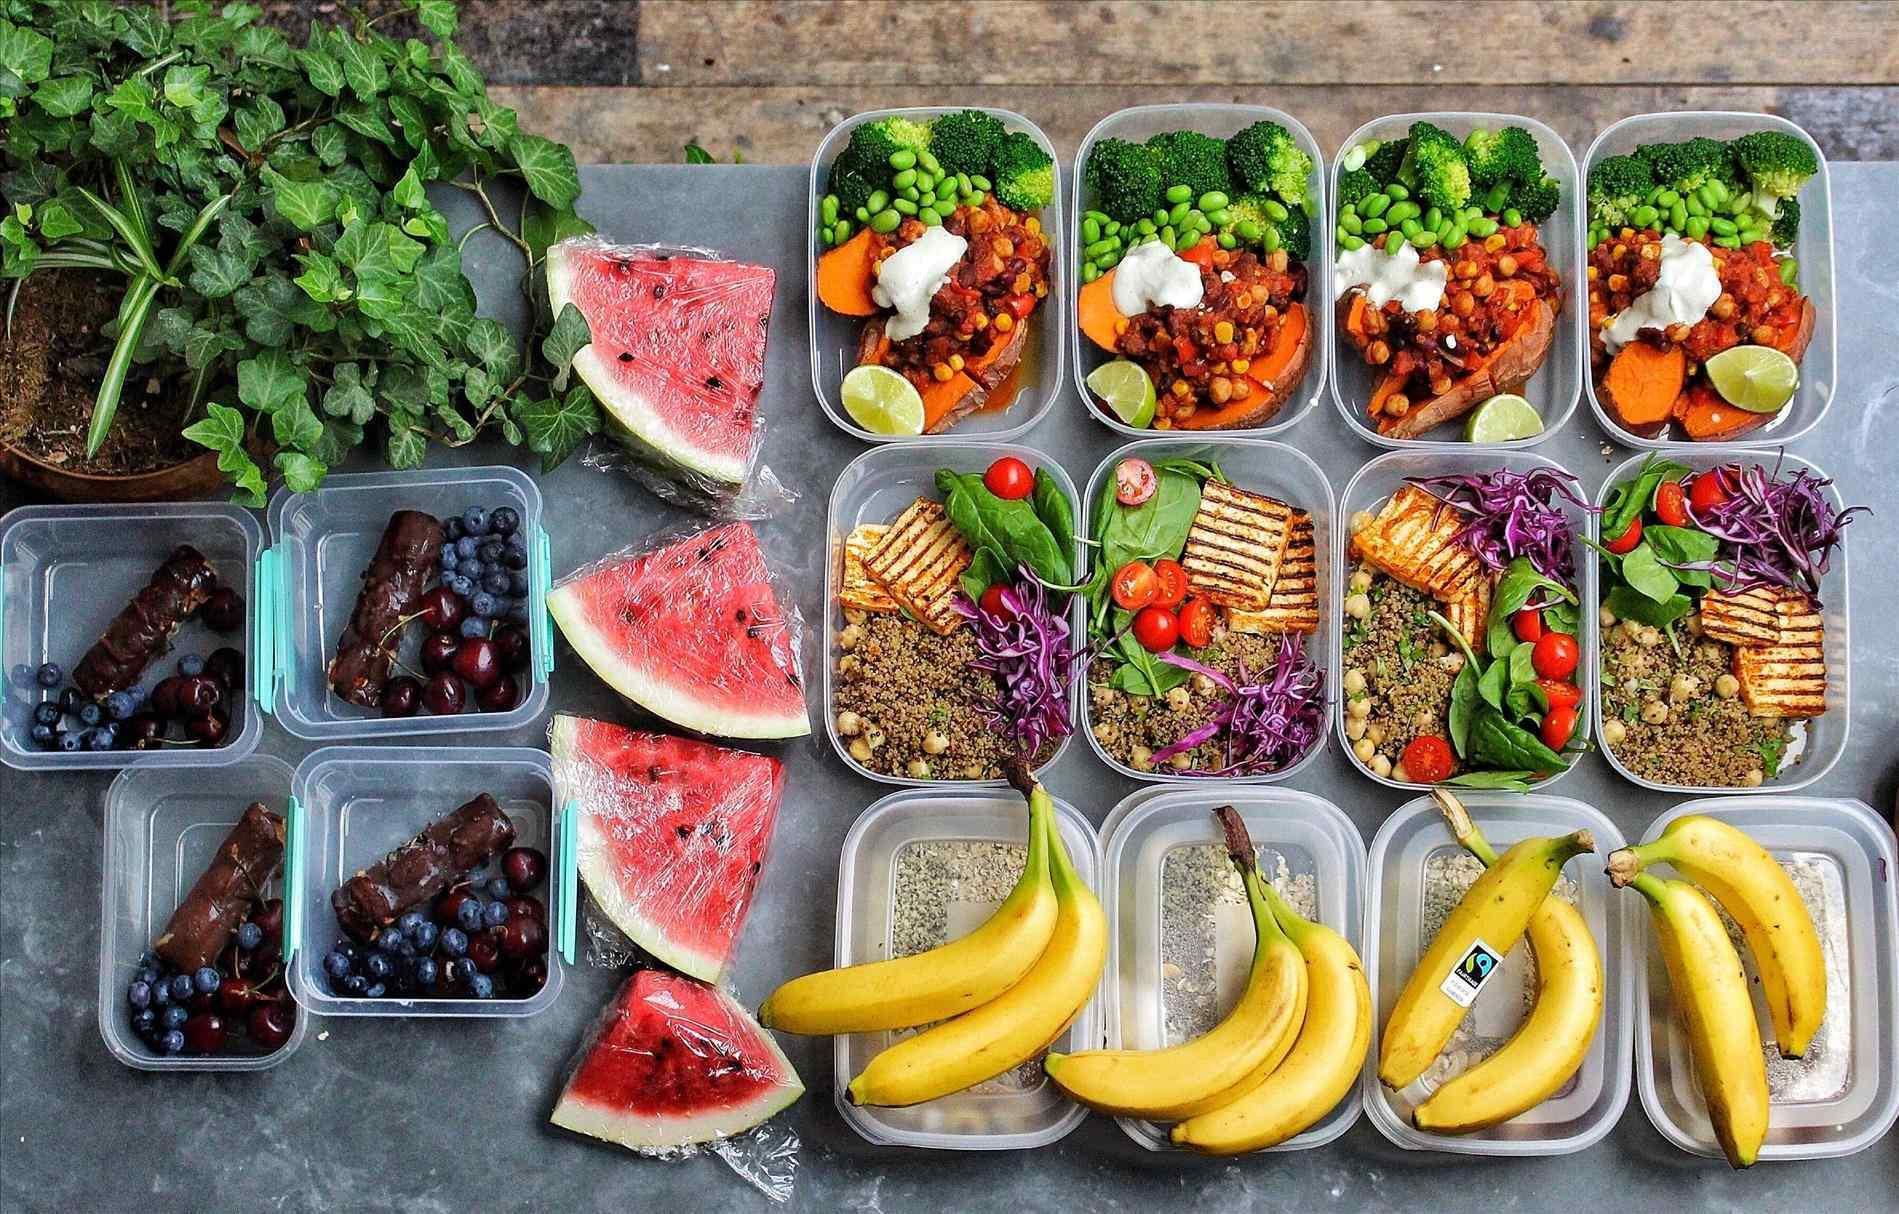 Healthy Vegan Breakfast For Weight Loss  Breakfast lunch rhyoutube what vegan weight loss meals